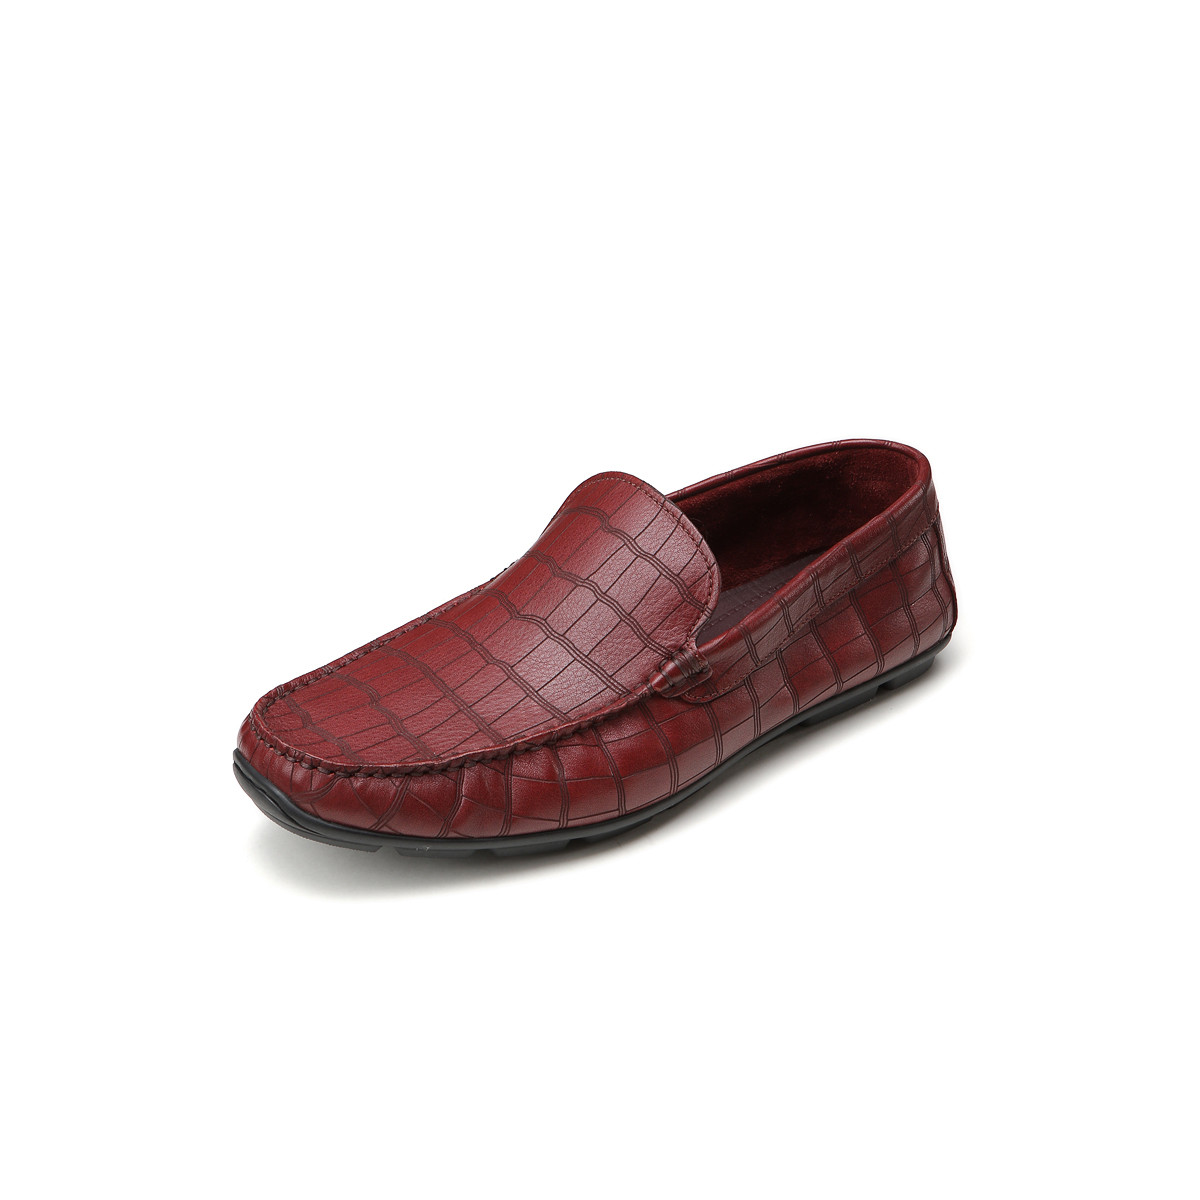 BOSSSUNWEN牛皮石头纹套脚男鞋男士商务皮鞋男皮鞋男鞋男士皮鞋男鞋31811012836753